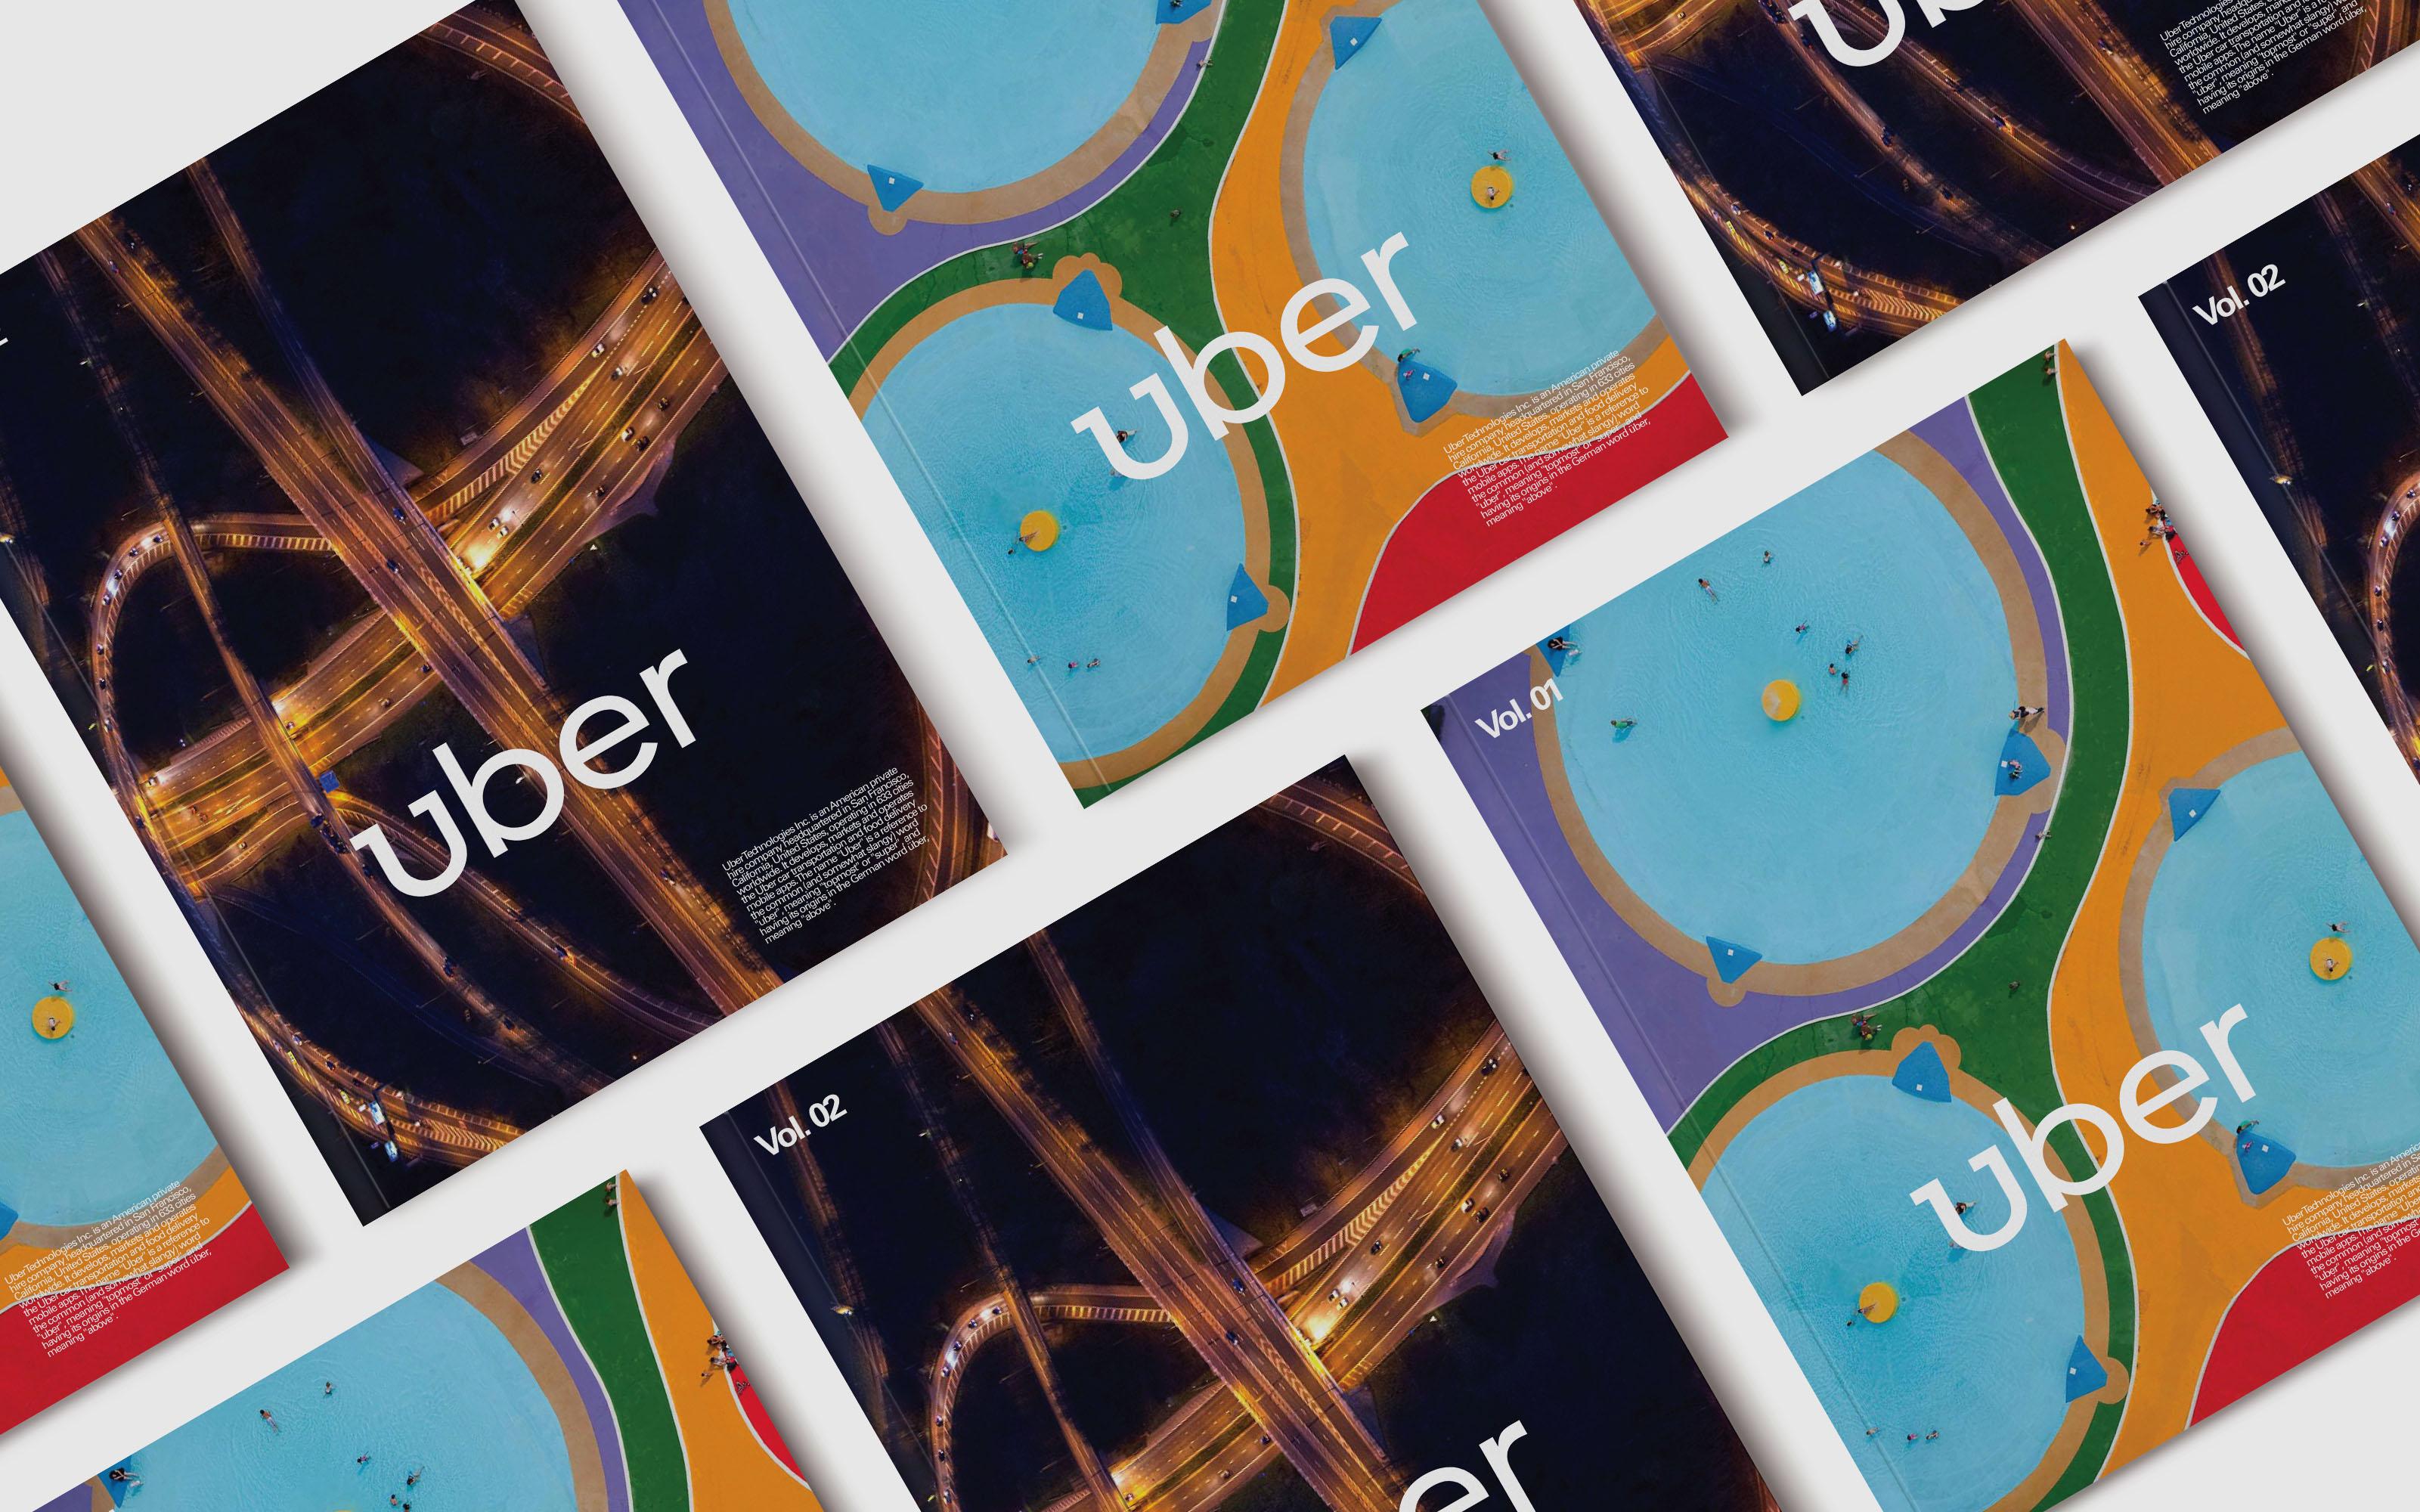 uber-magazine-cover